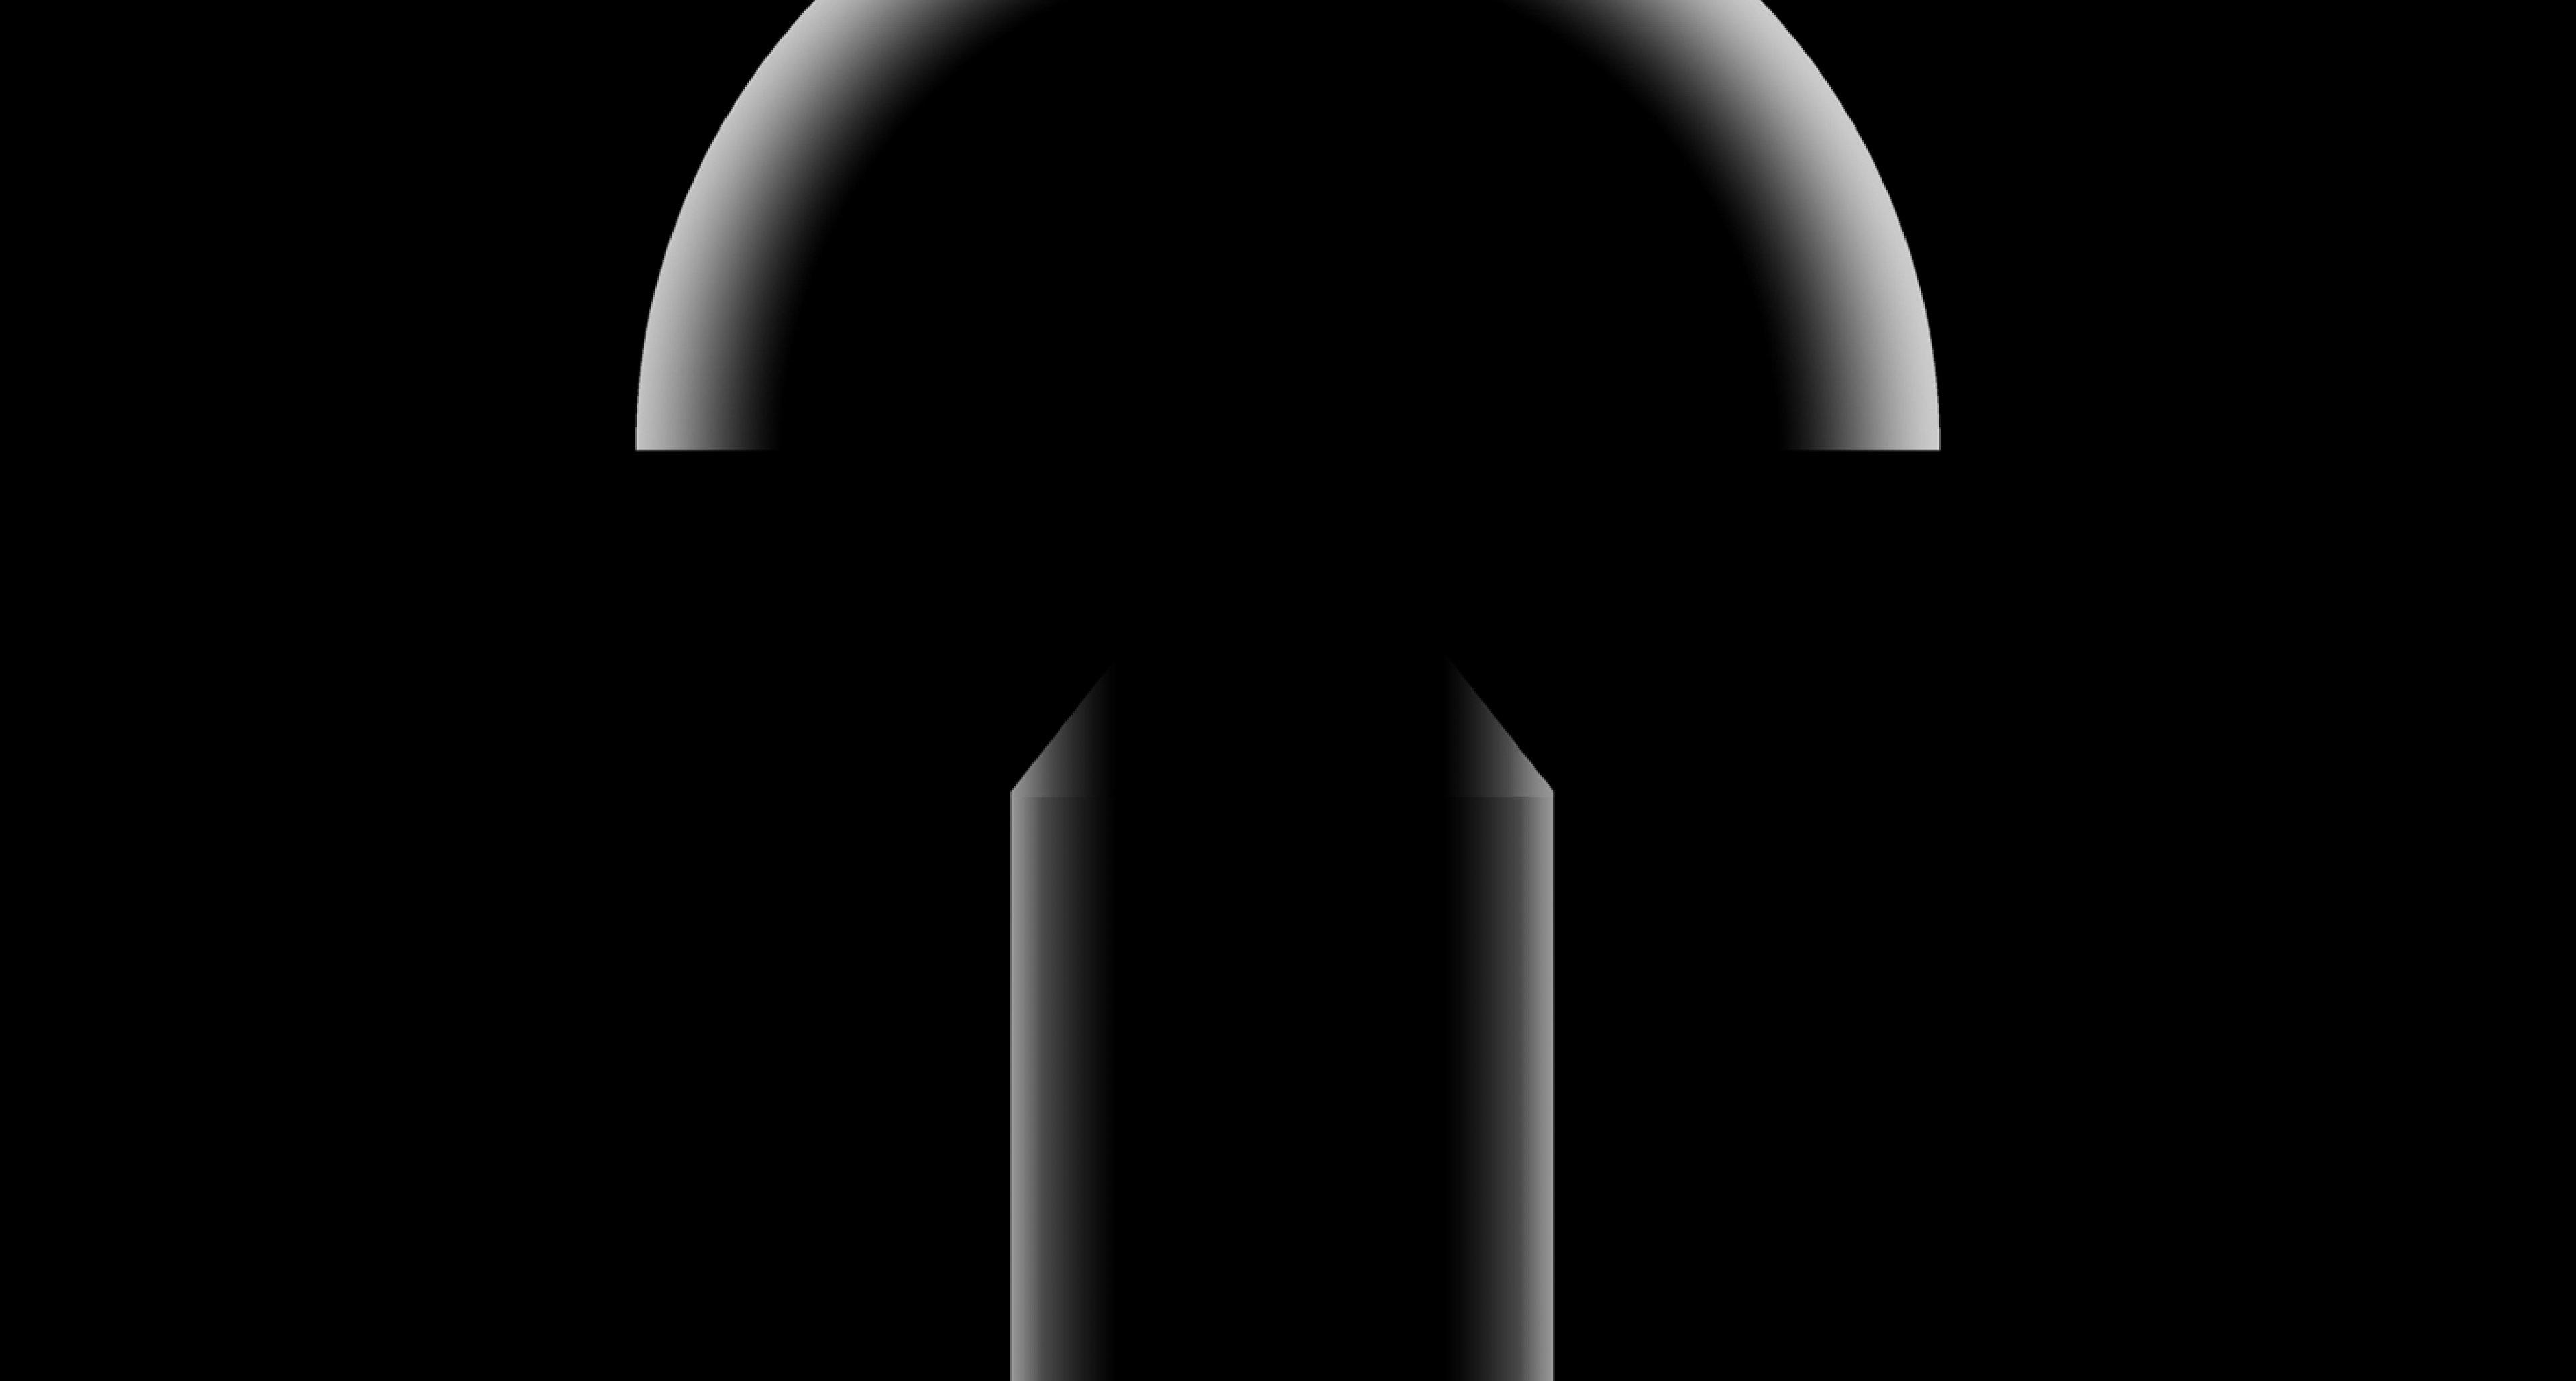 ey Visual / Abstraktion basierend auf: Vico Magistretti, Atollo, 1977 © Vico Magistretti Foundation, Oluce, Foto: Sammlung Vitra Design Museum, Daniel Spehr